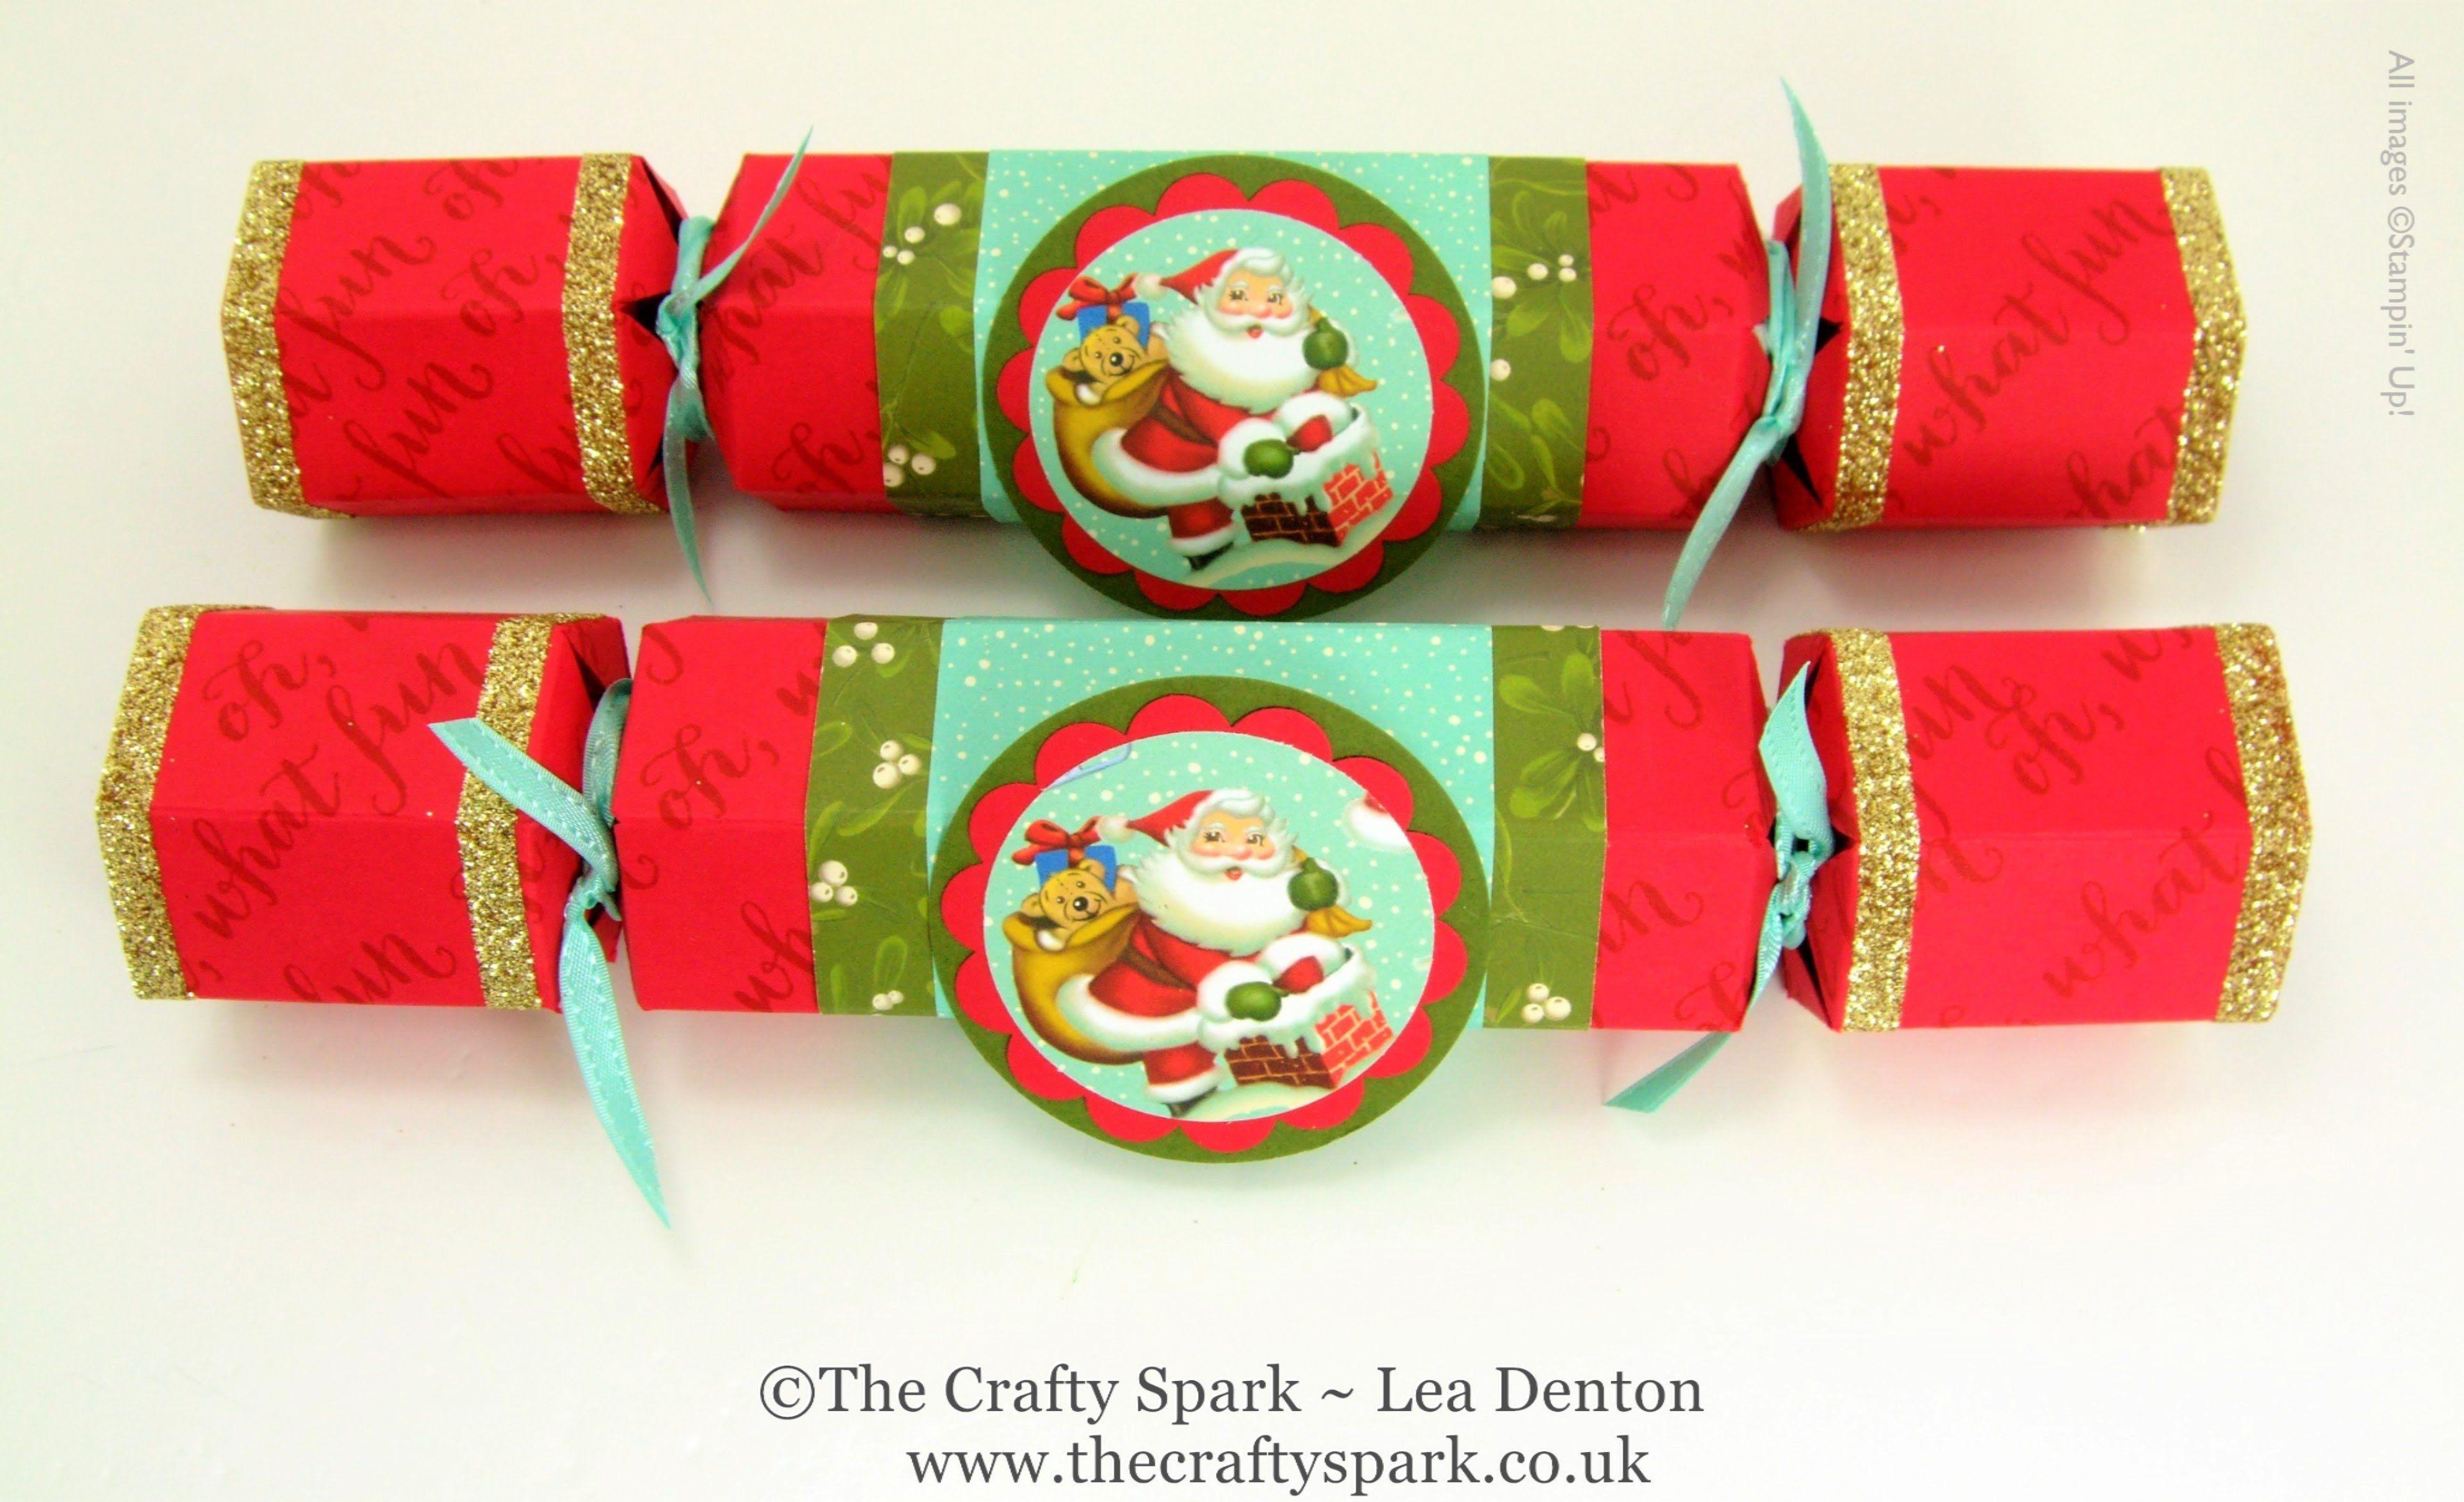 Making your own christmas cracker bon bon bastelideen pinterest making your own christmas cracker bon bon solutioingenieria Image collections